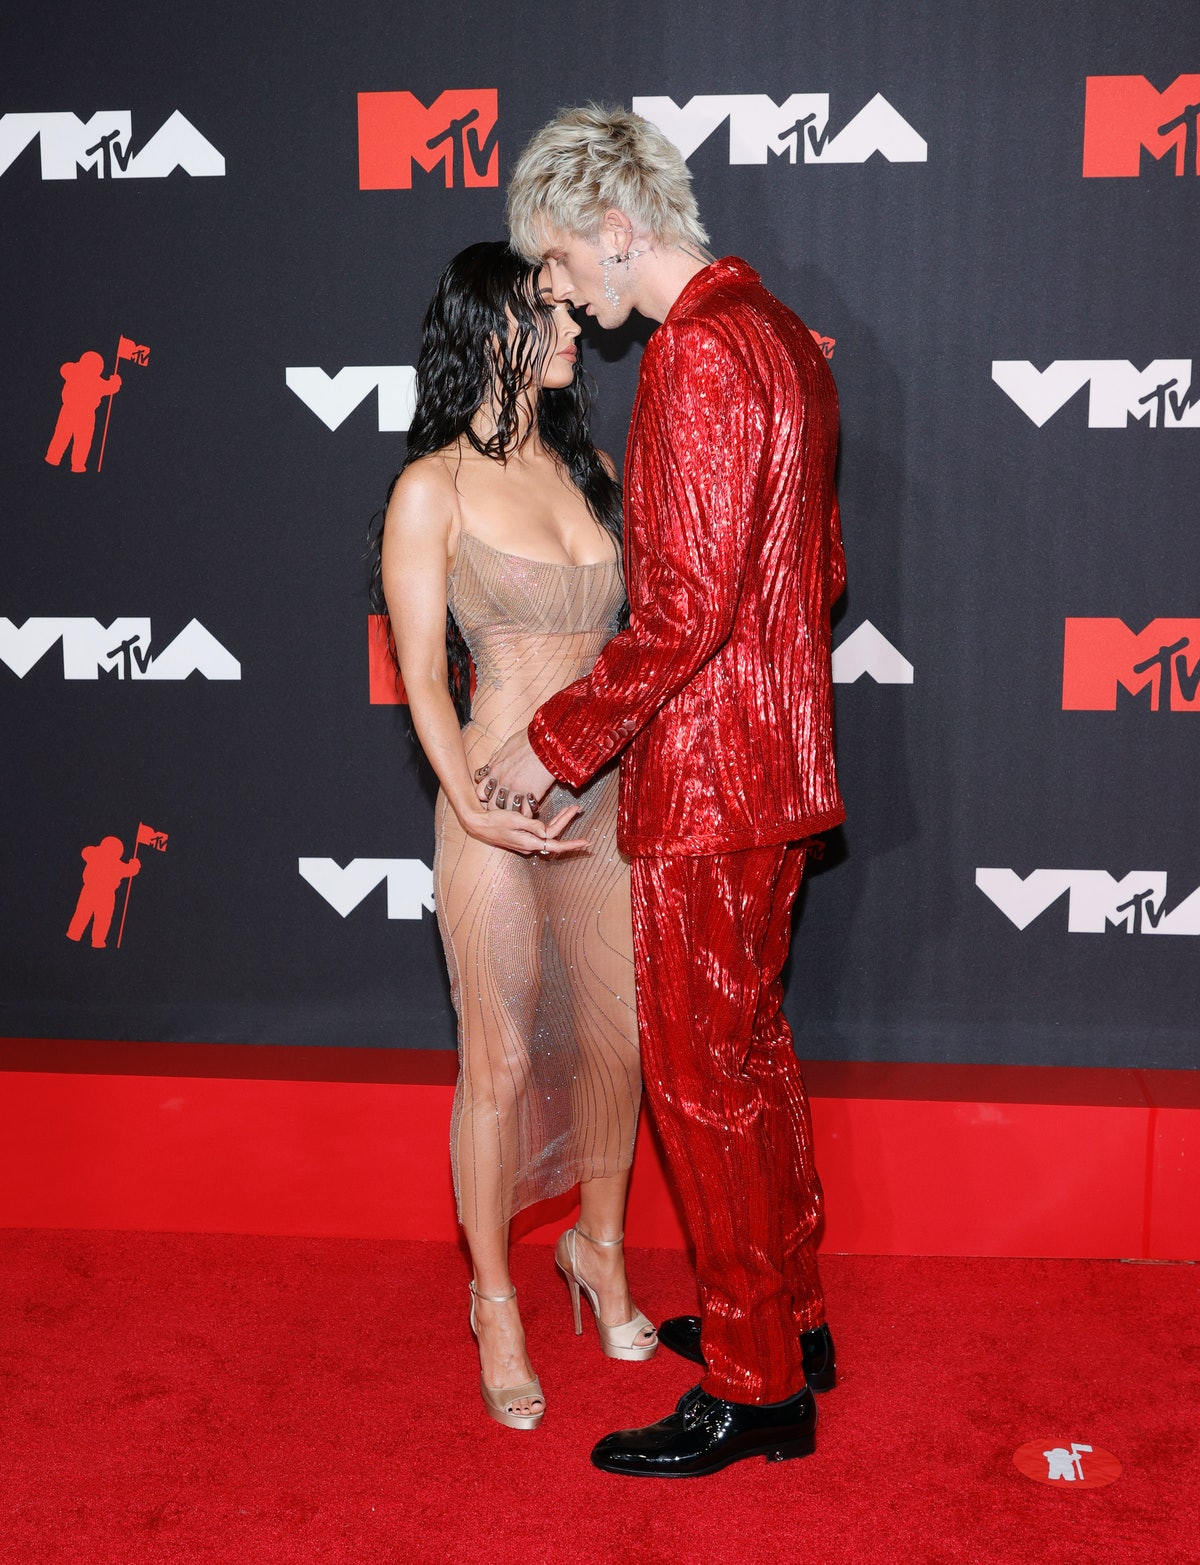 Megan Fox and Machine Gun Kelly's VMAs body language was seriously hot.